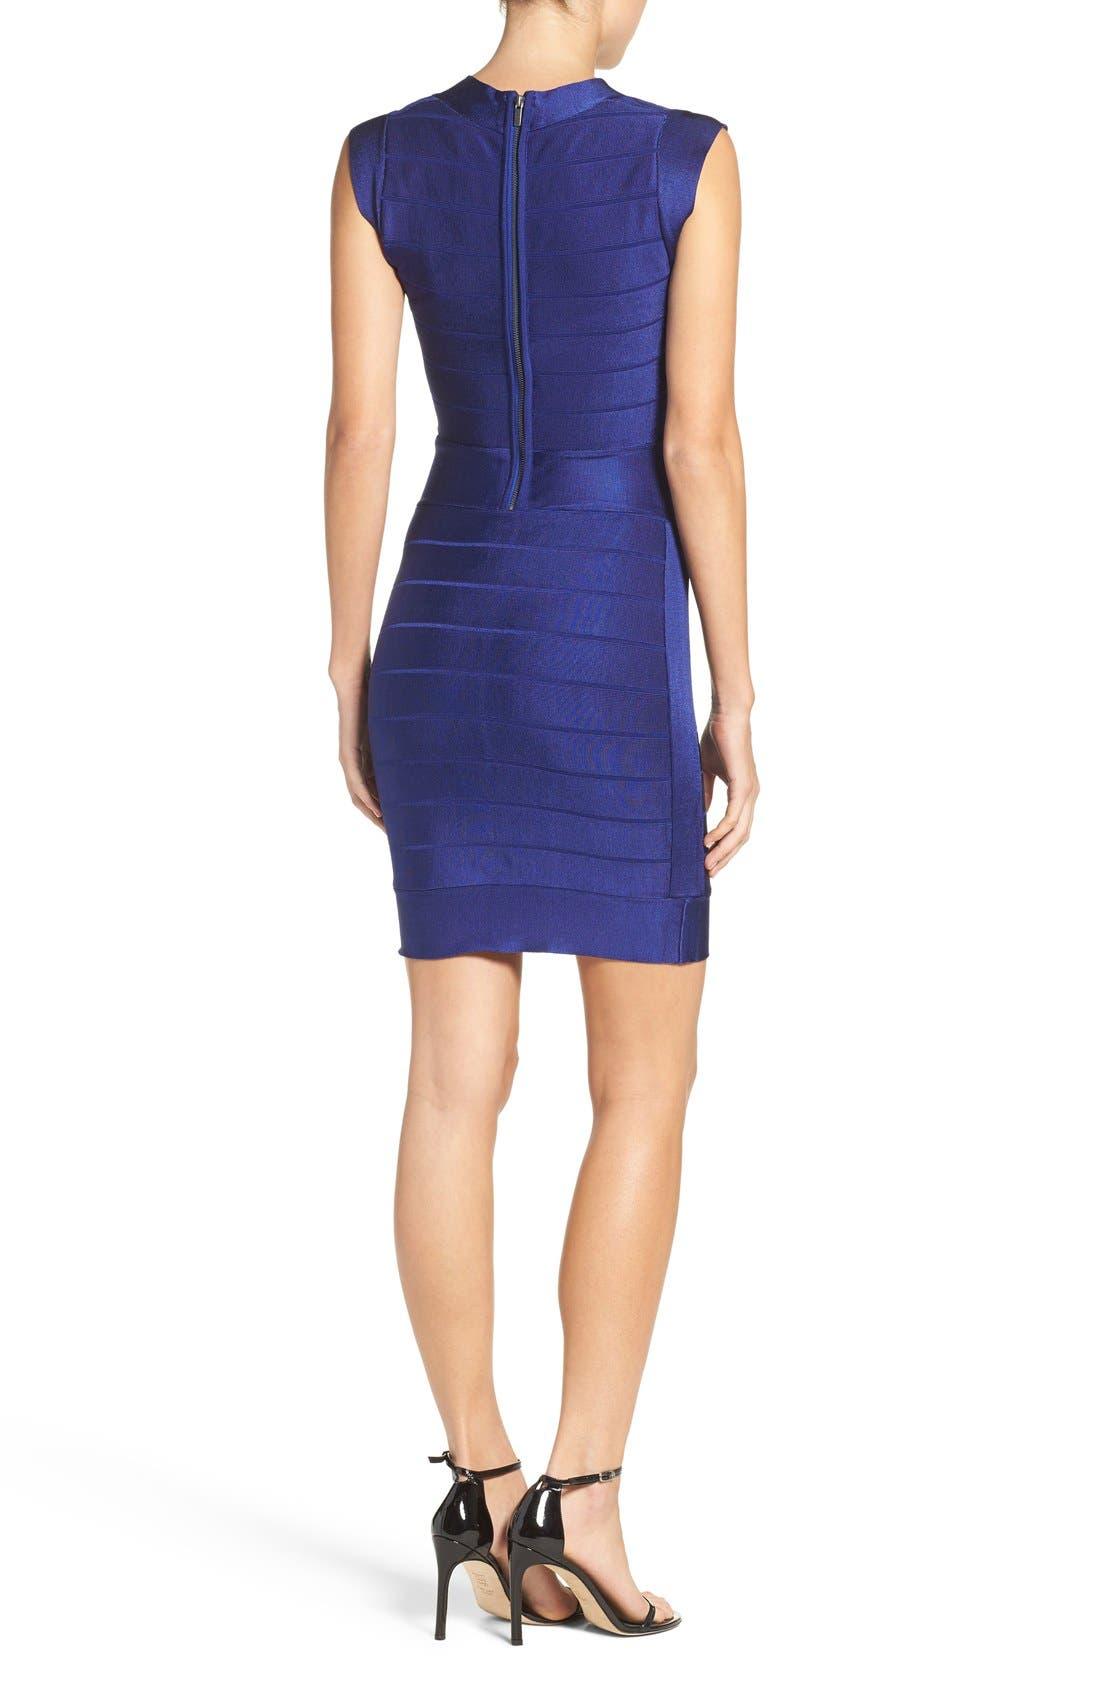 Spotlight Bandage Dress,                             Alternate thumbnail 2, color,                             Maya Blue